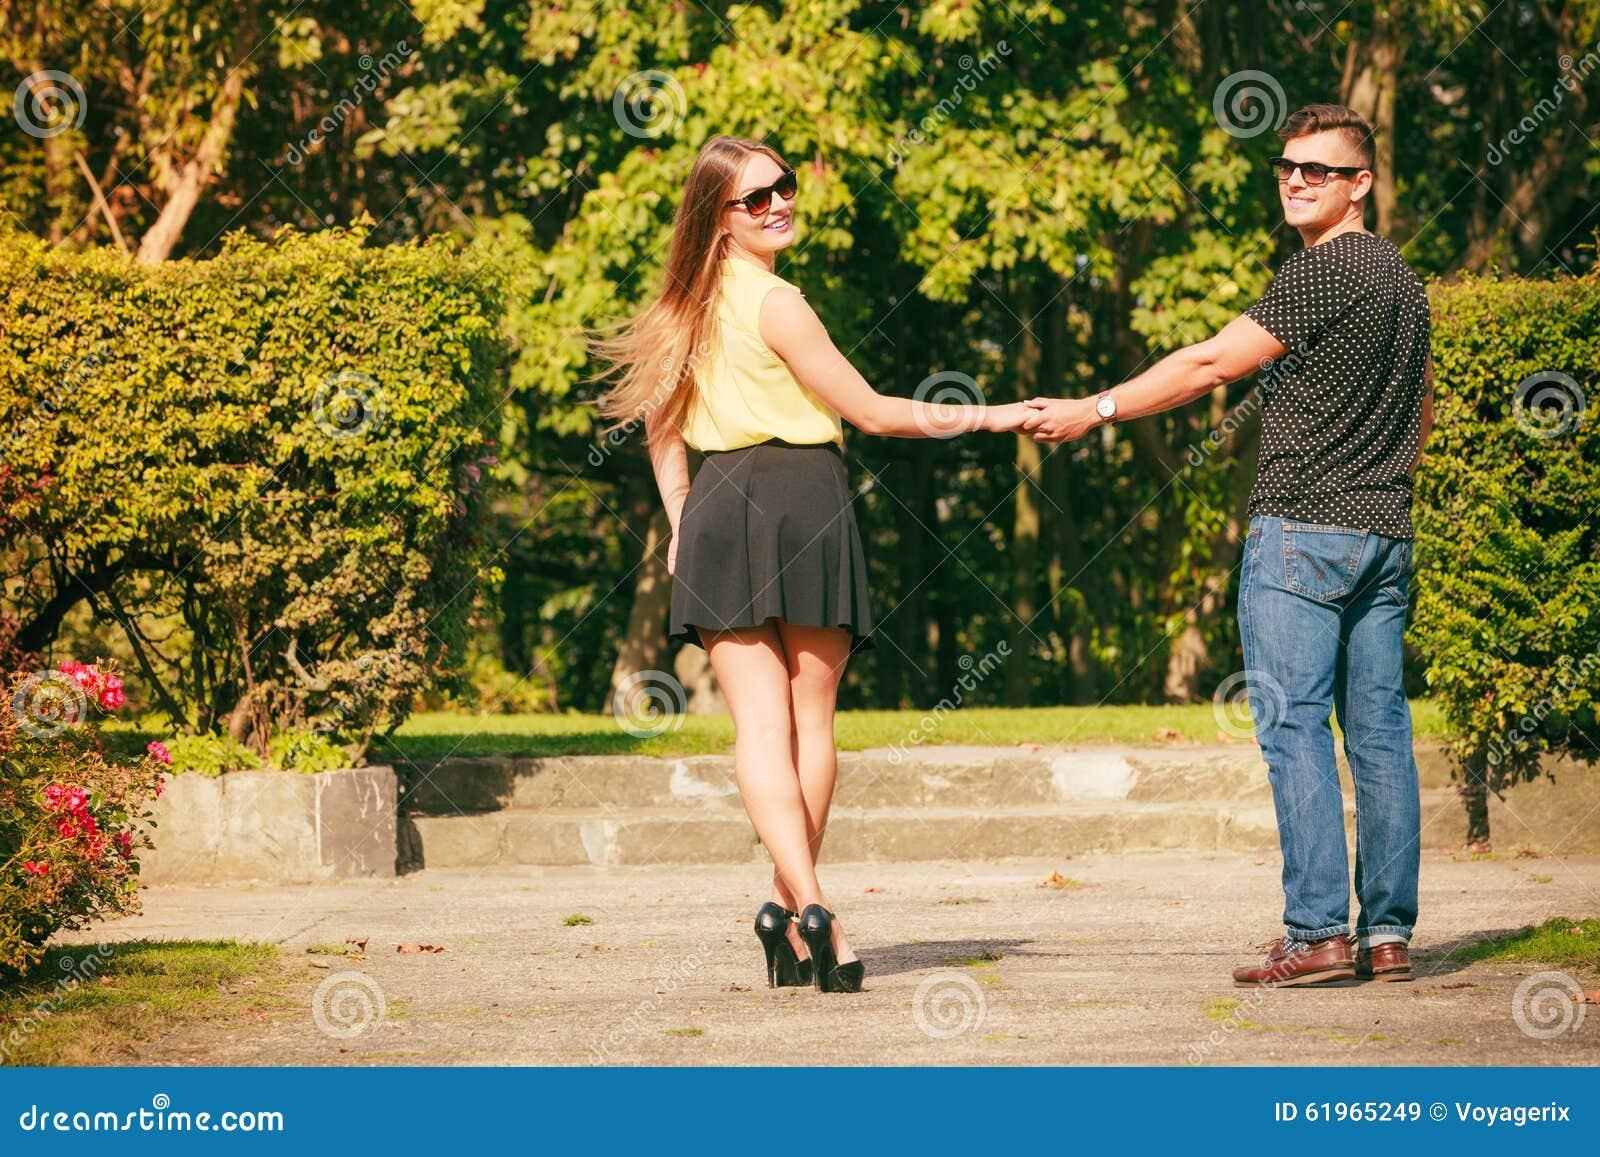 Dating outdoor singles